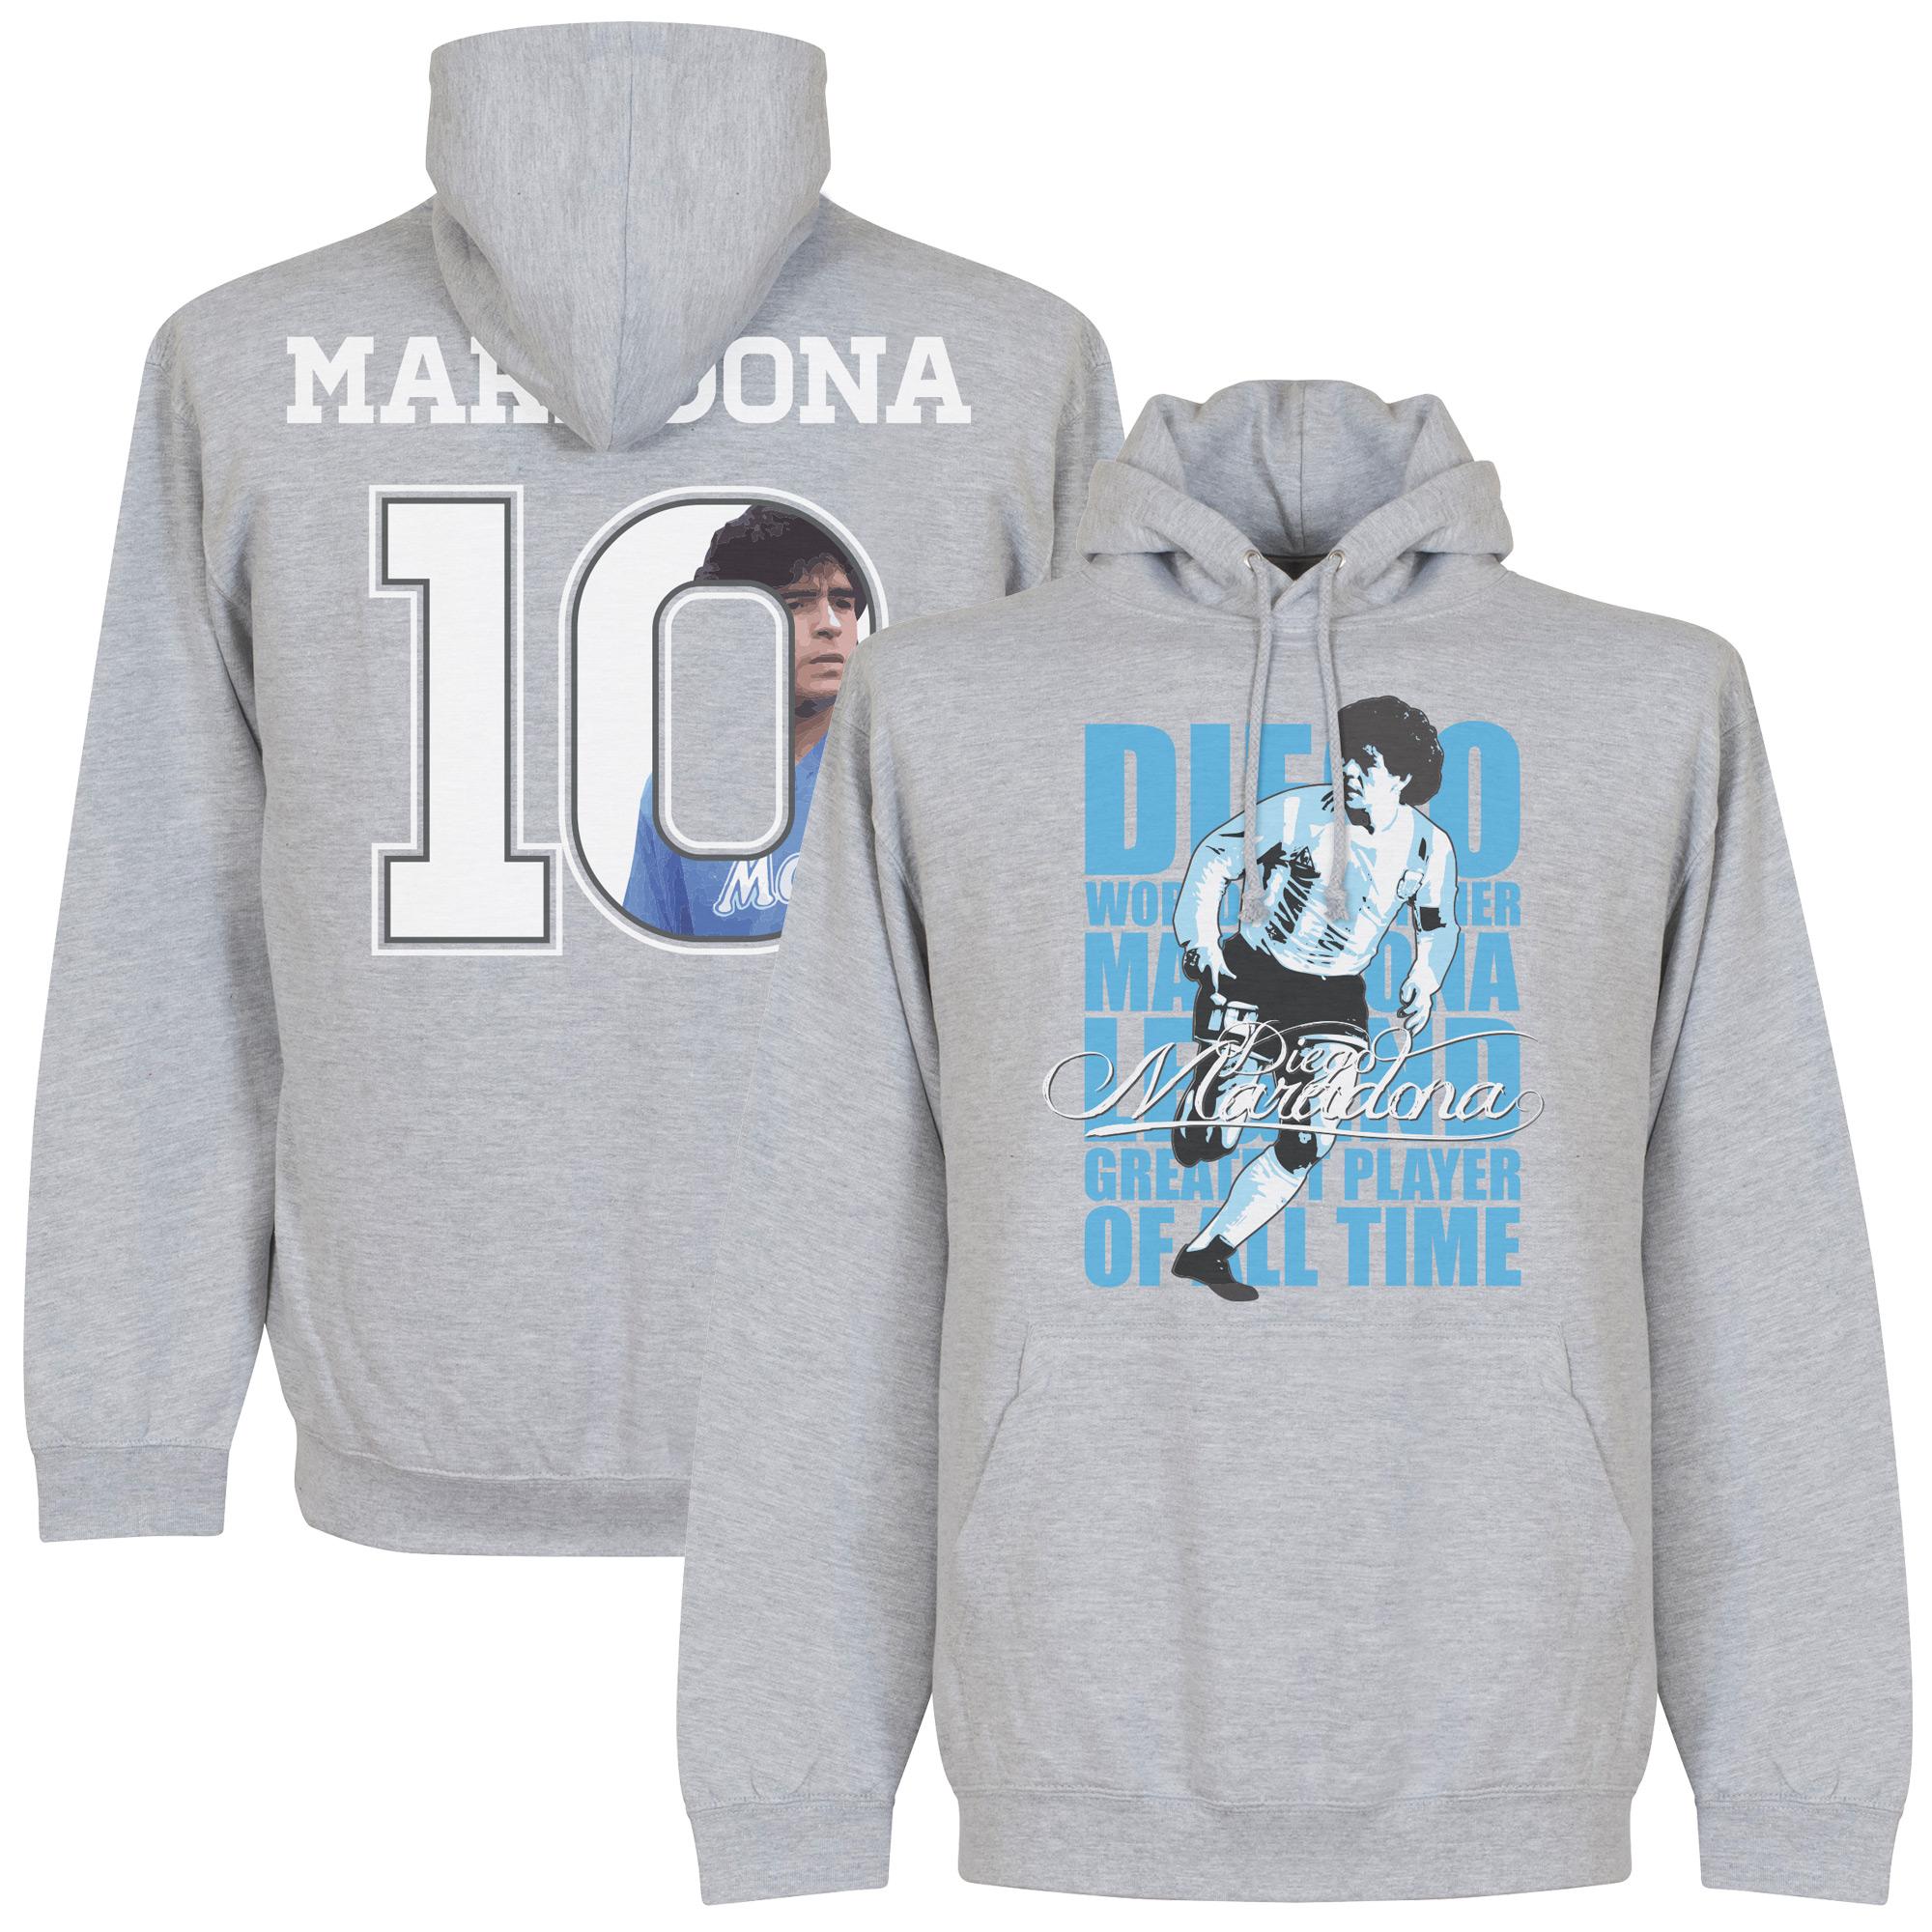 Maradona 10 Gallery Hooded Sweater